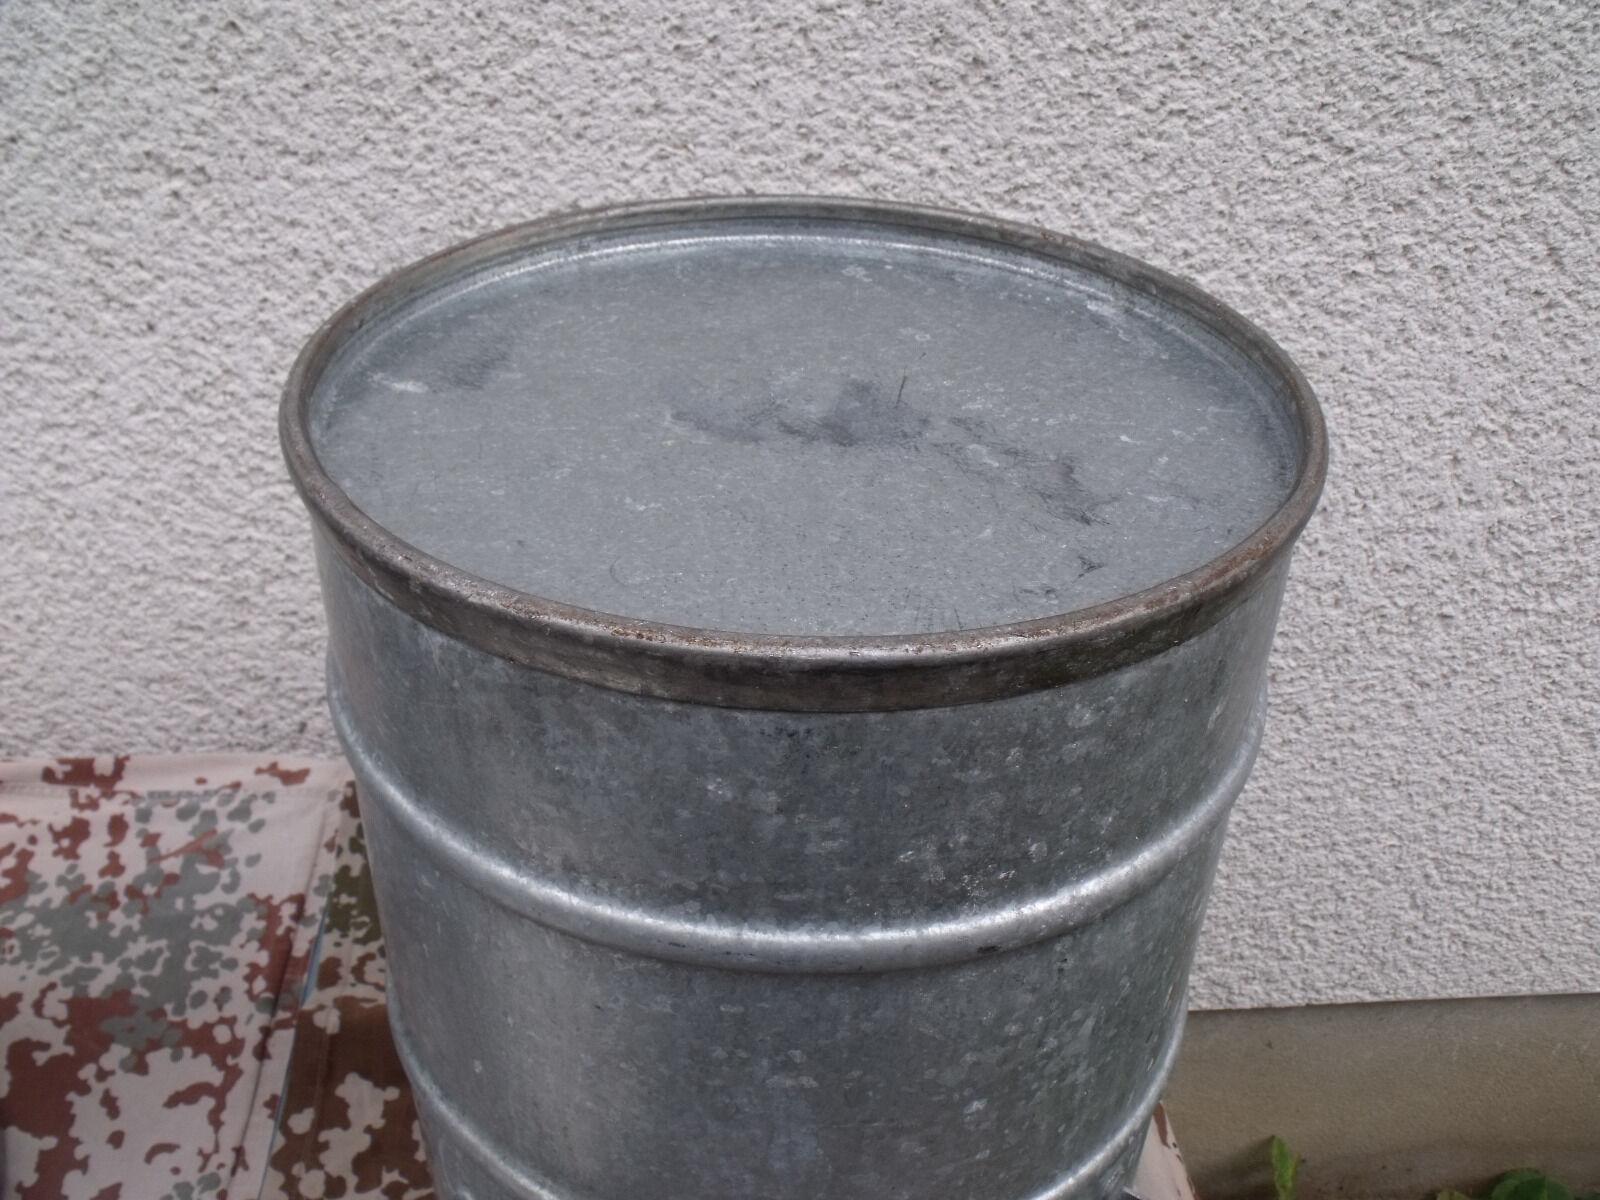 Speisentherme Speisentherme Speisentherme Thermobehälter Feldküche Erbsensuppe Glühwein Kühlbox Essenkübel | Neuheit  85cf5b